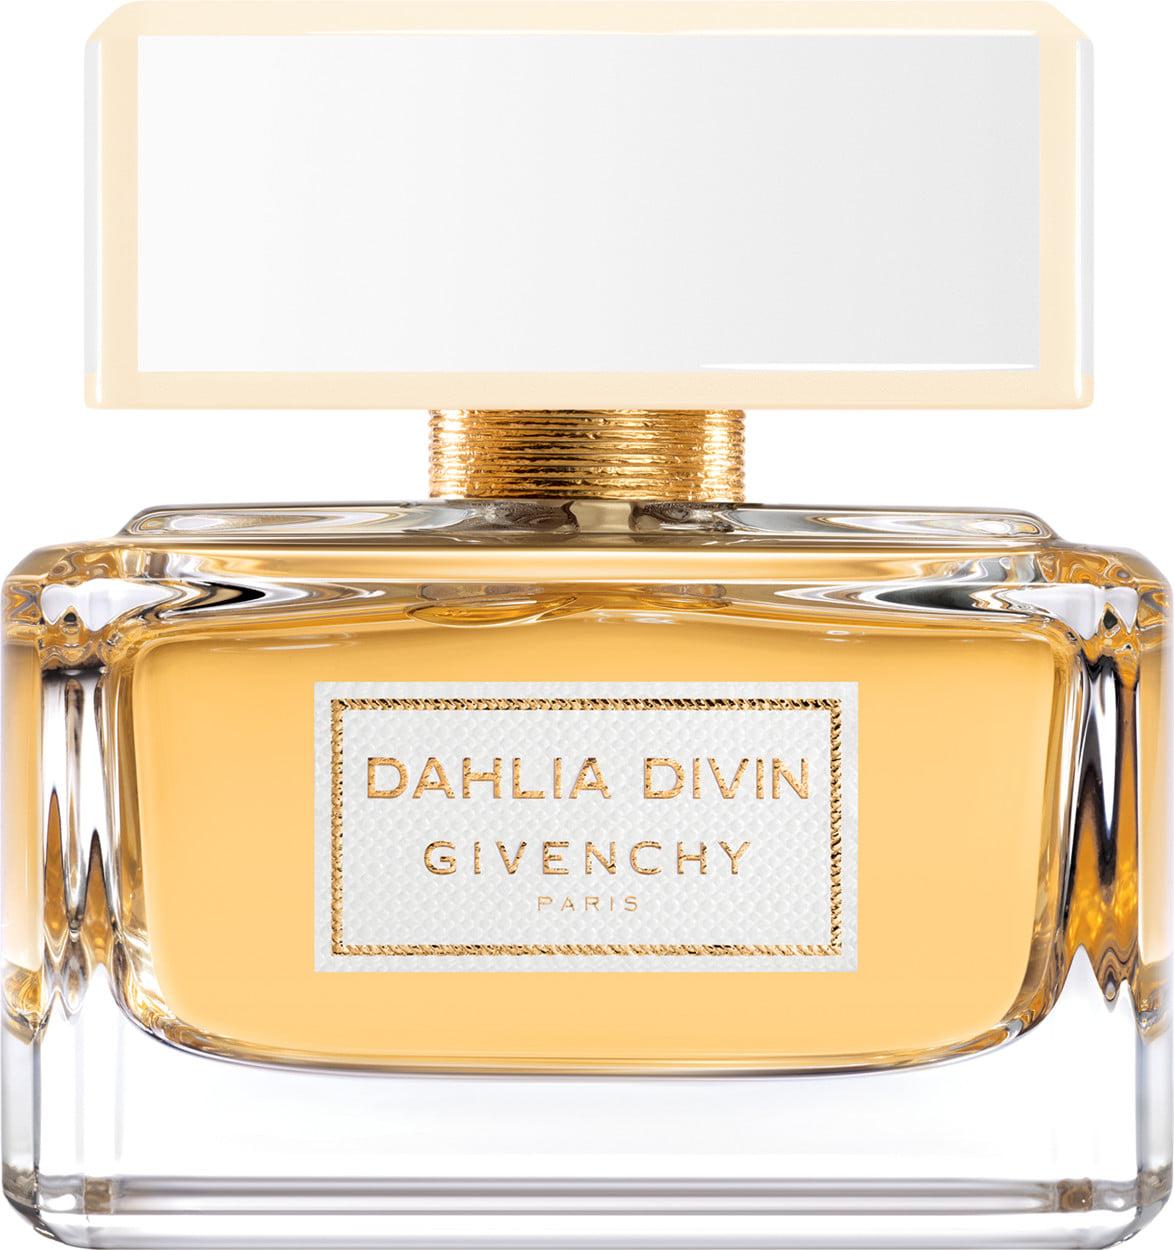 Givenchy Dahlia Divin парфюмированная вода 30мл (Живанши Далия Дивин)